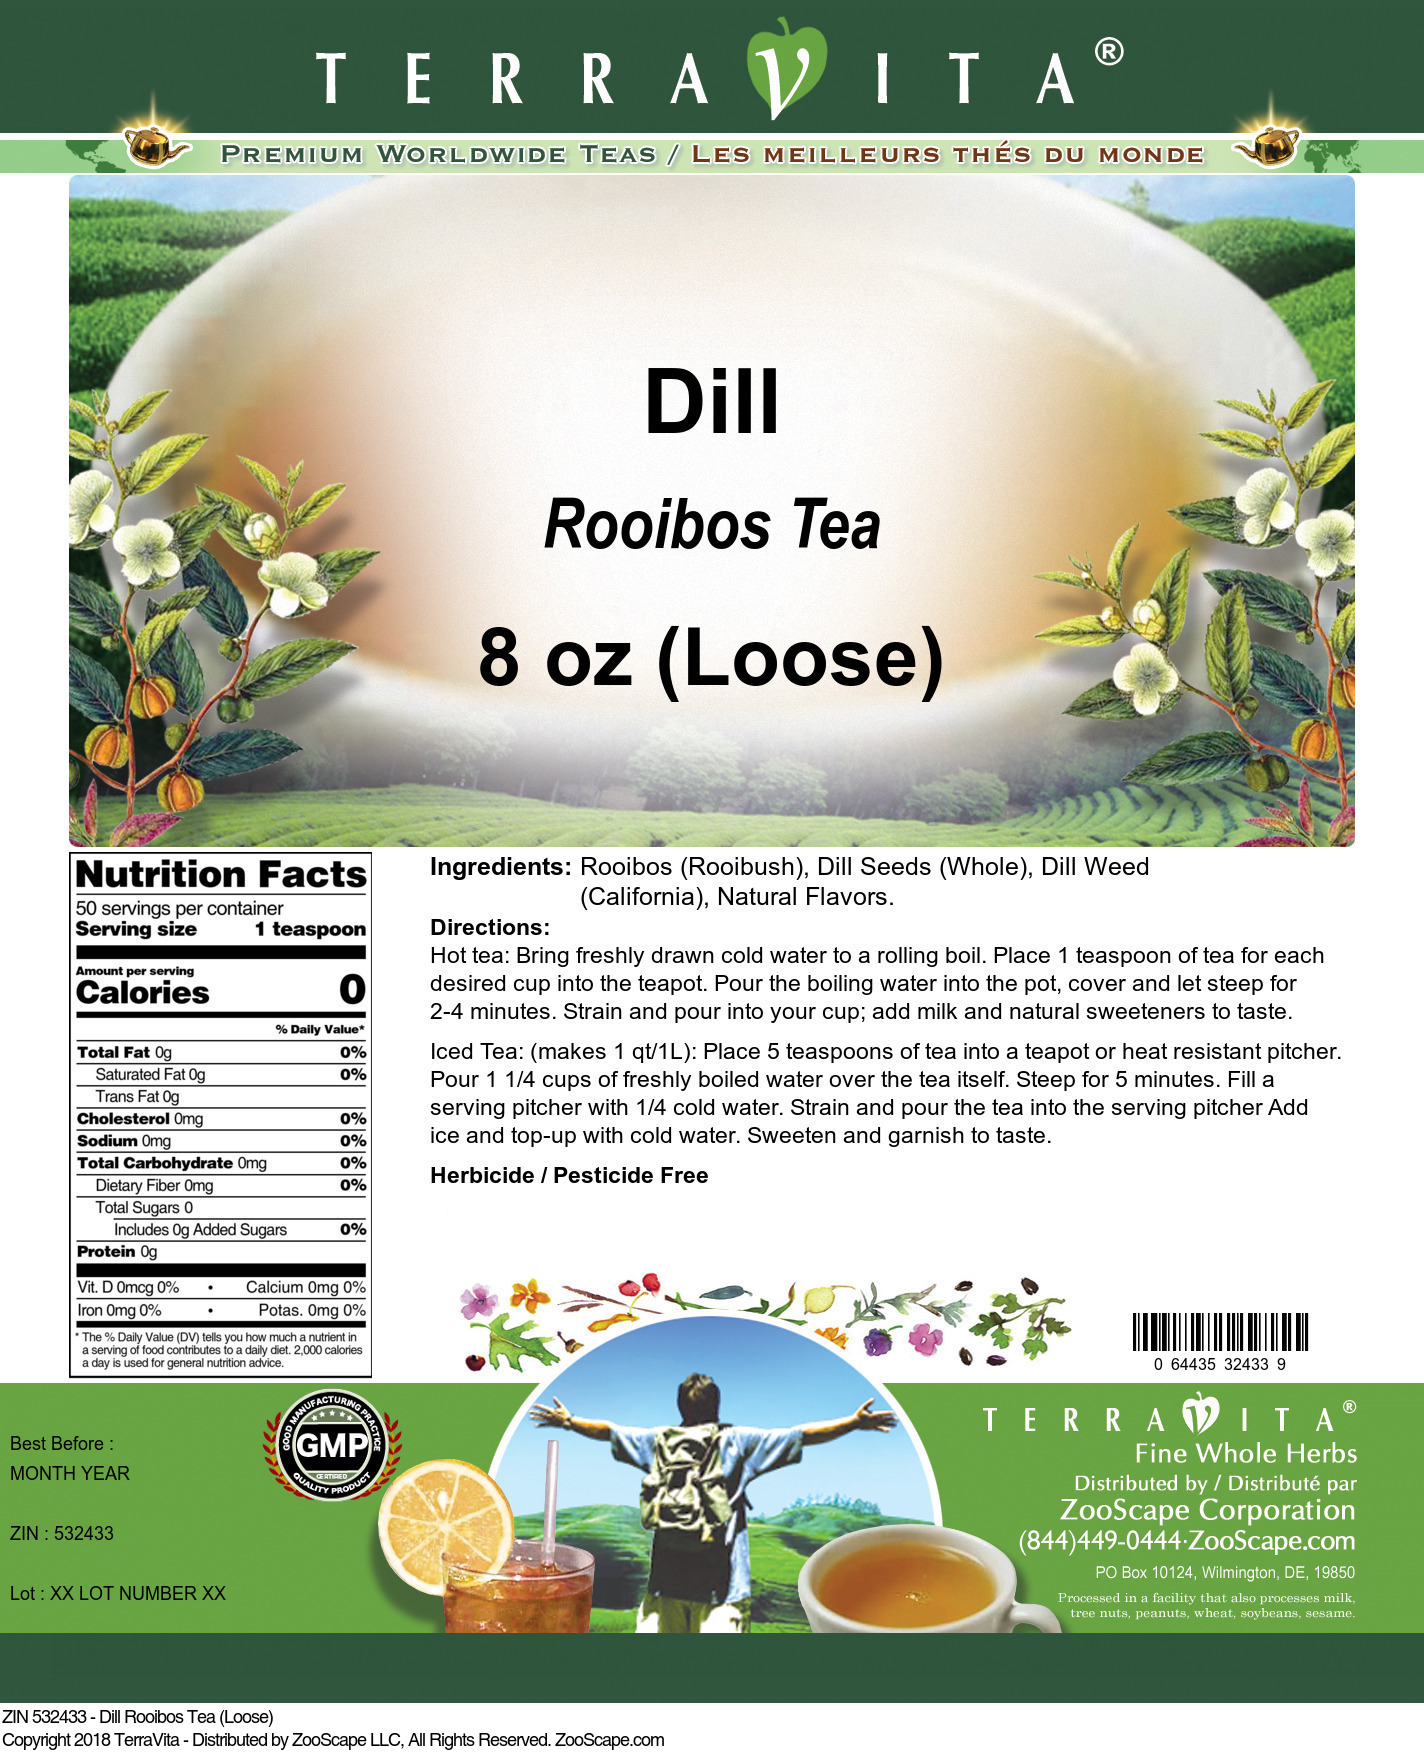 Dill Rooibos Tea